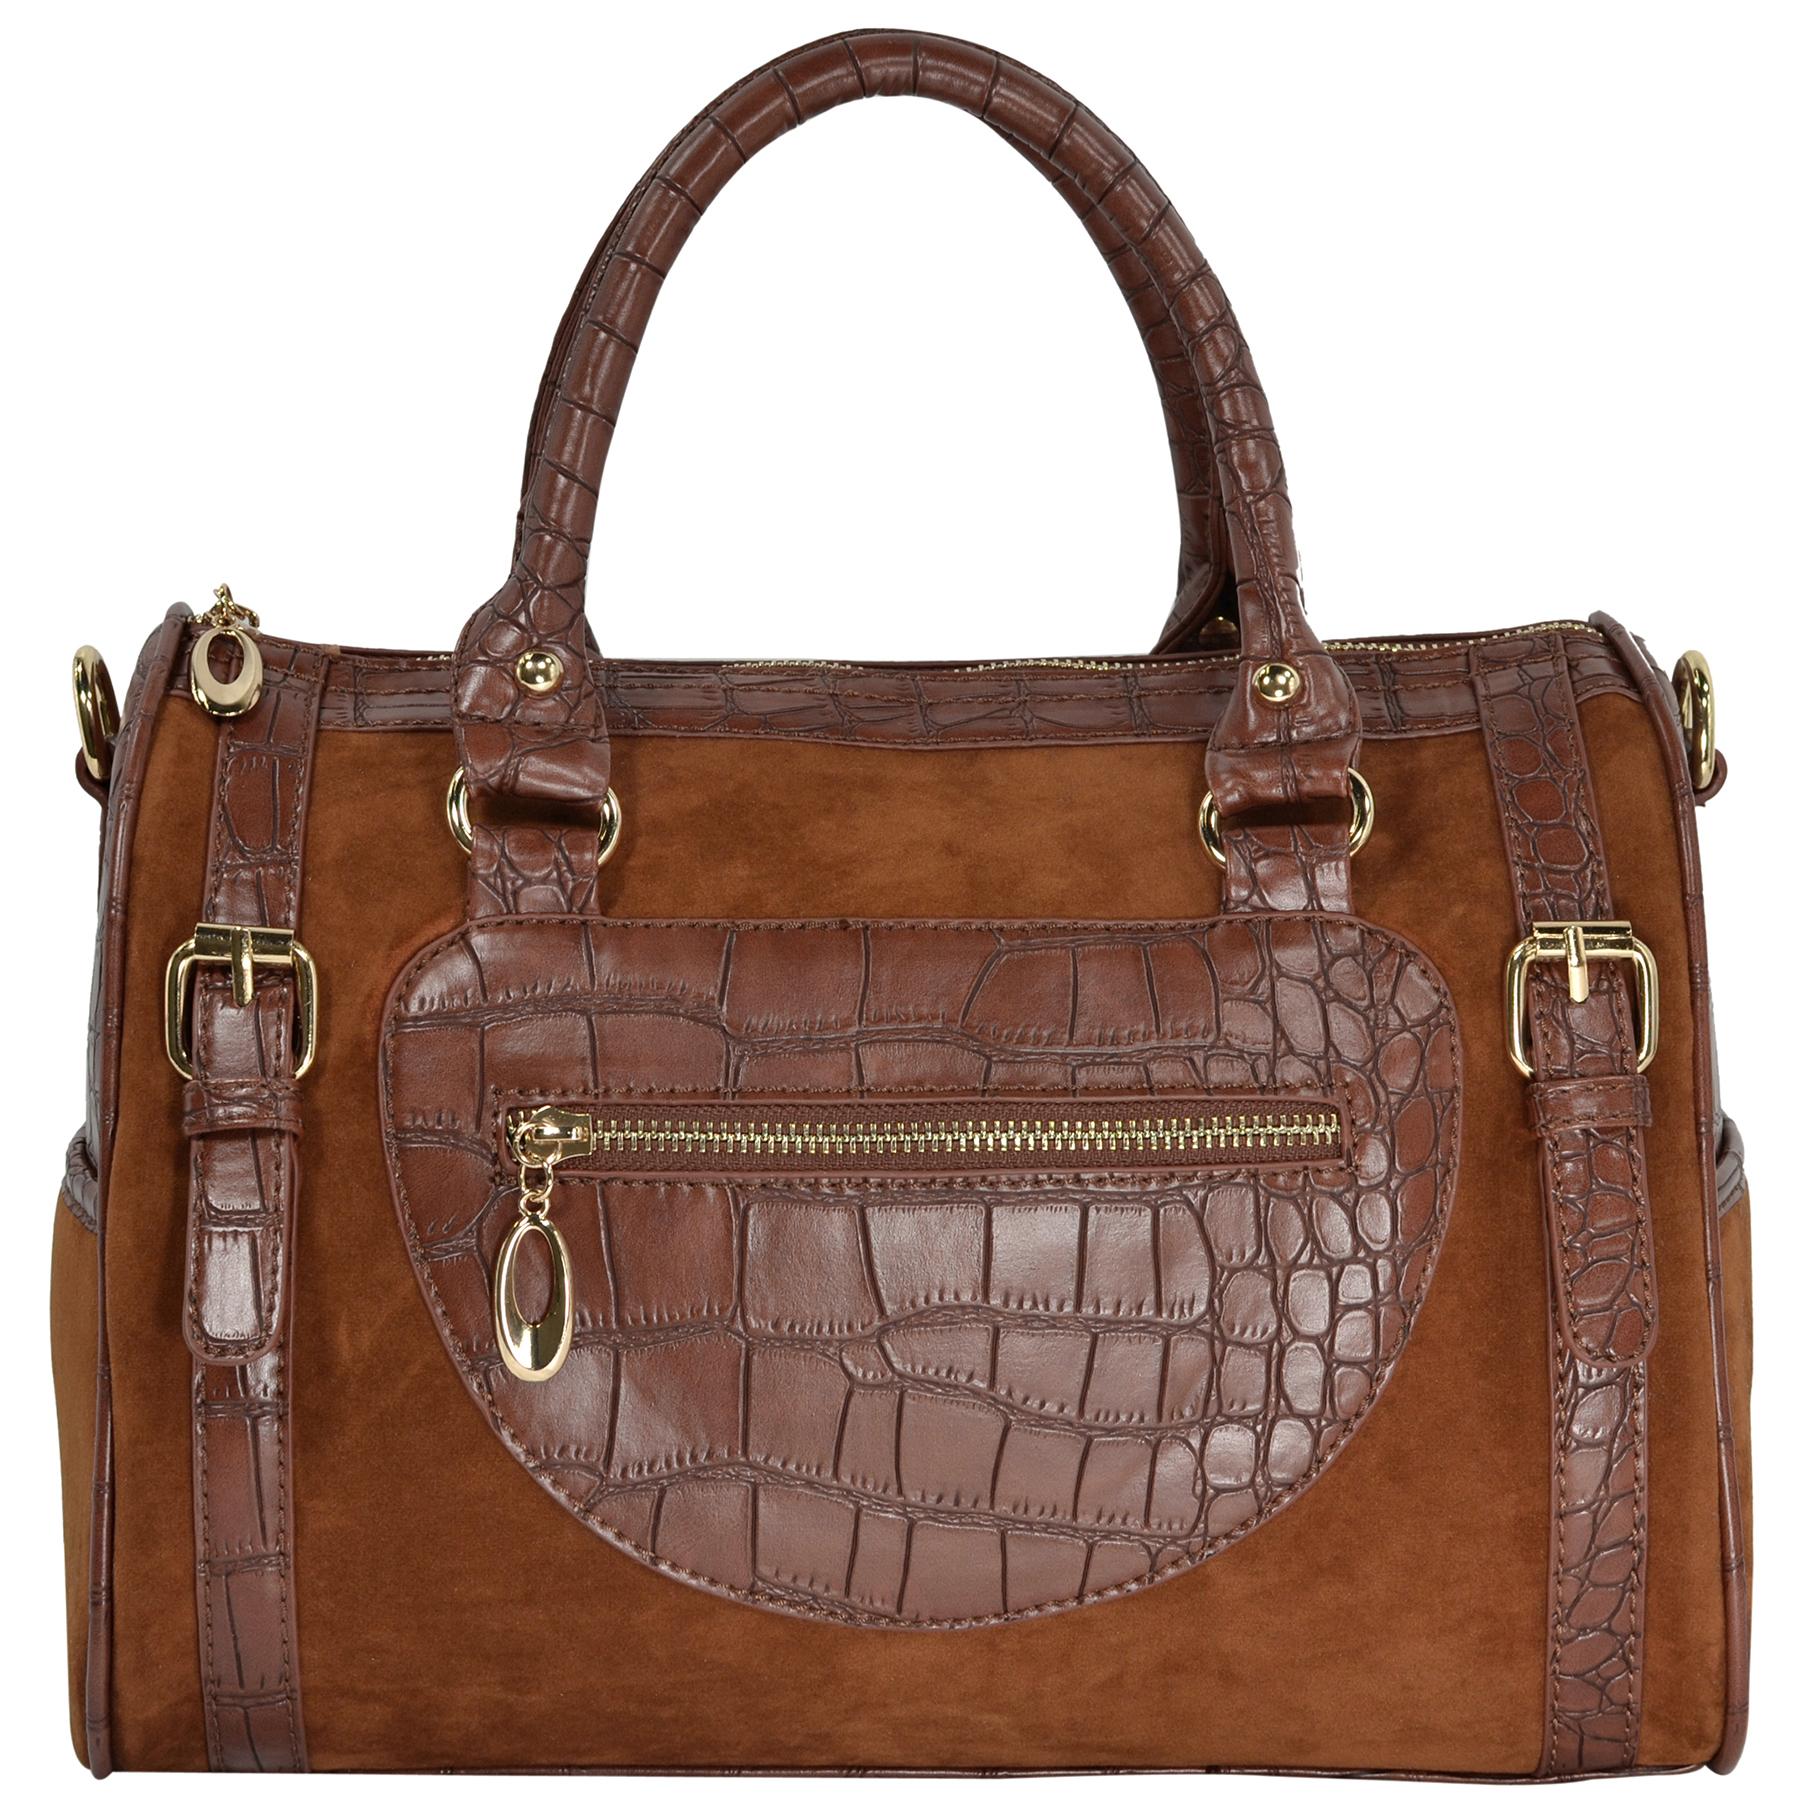 mg-collection-brandi-brown-bowler-handbag-tb-h0339brn-3.jpg